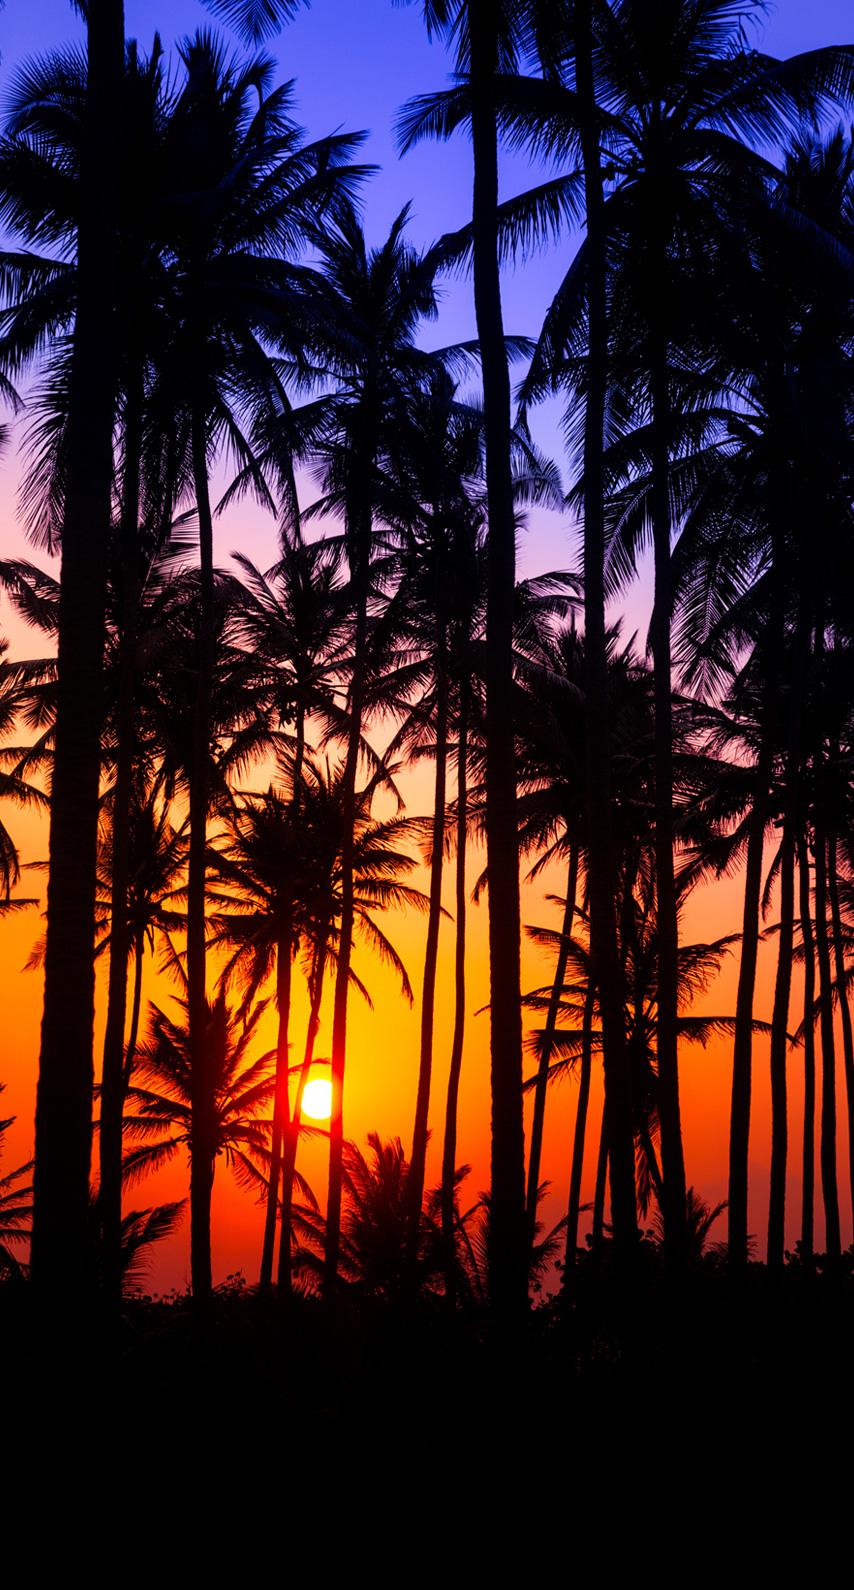 palmtrees, holidays